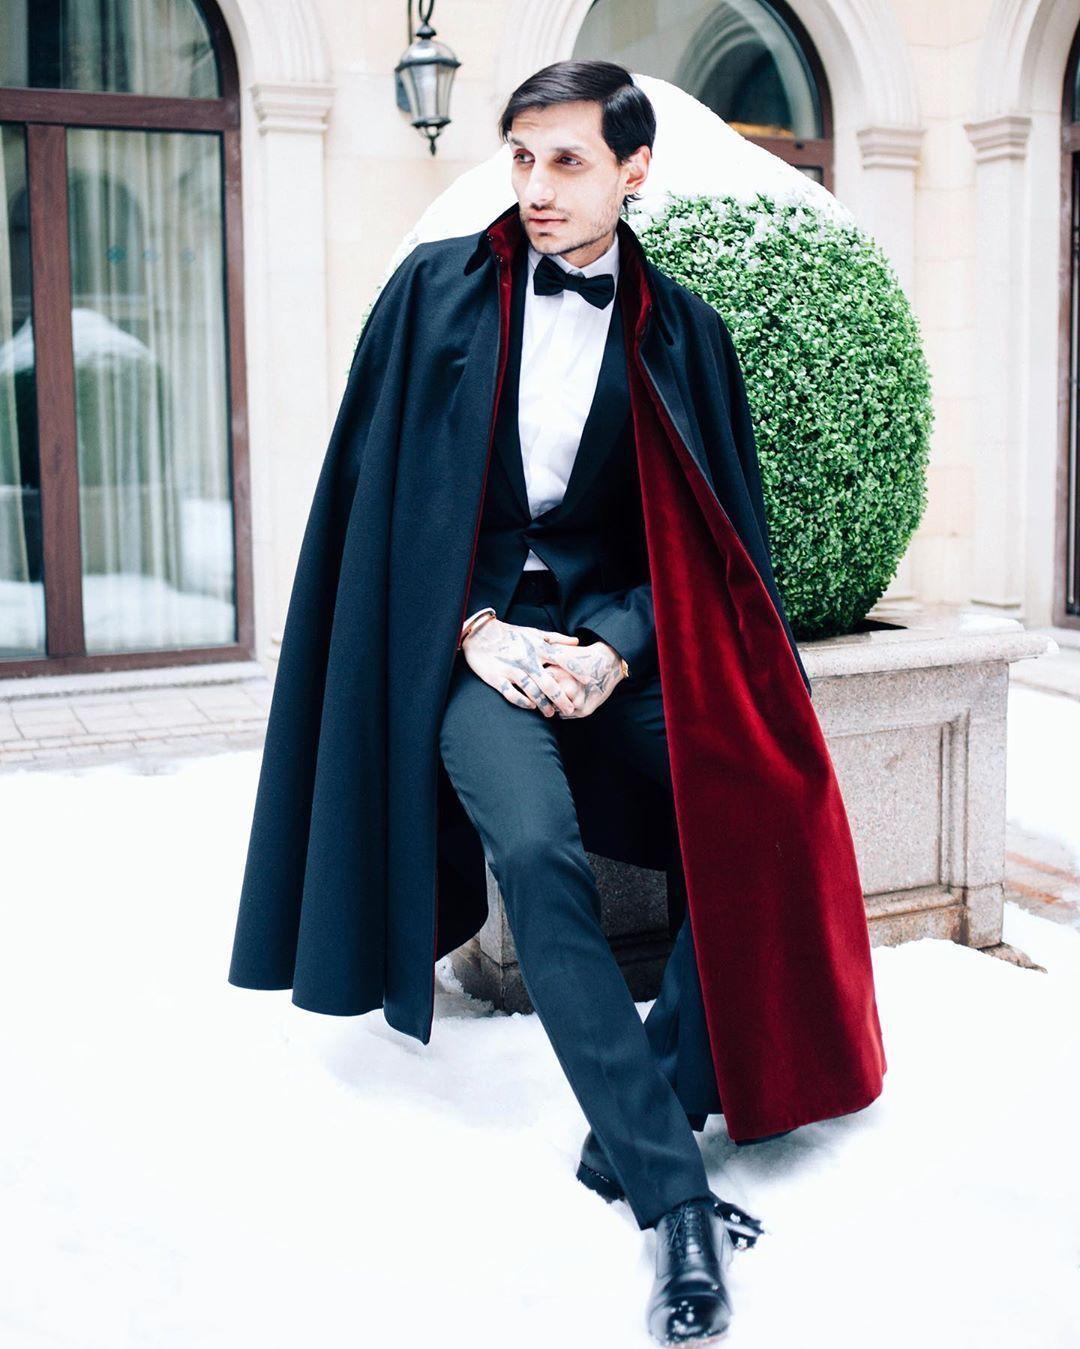 Alfonso Cape Black Burgundy Merino Wool Cape With Velvet Collar In 2020 Dapper Mens Fashion Velvet Clothes Suit Fashion